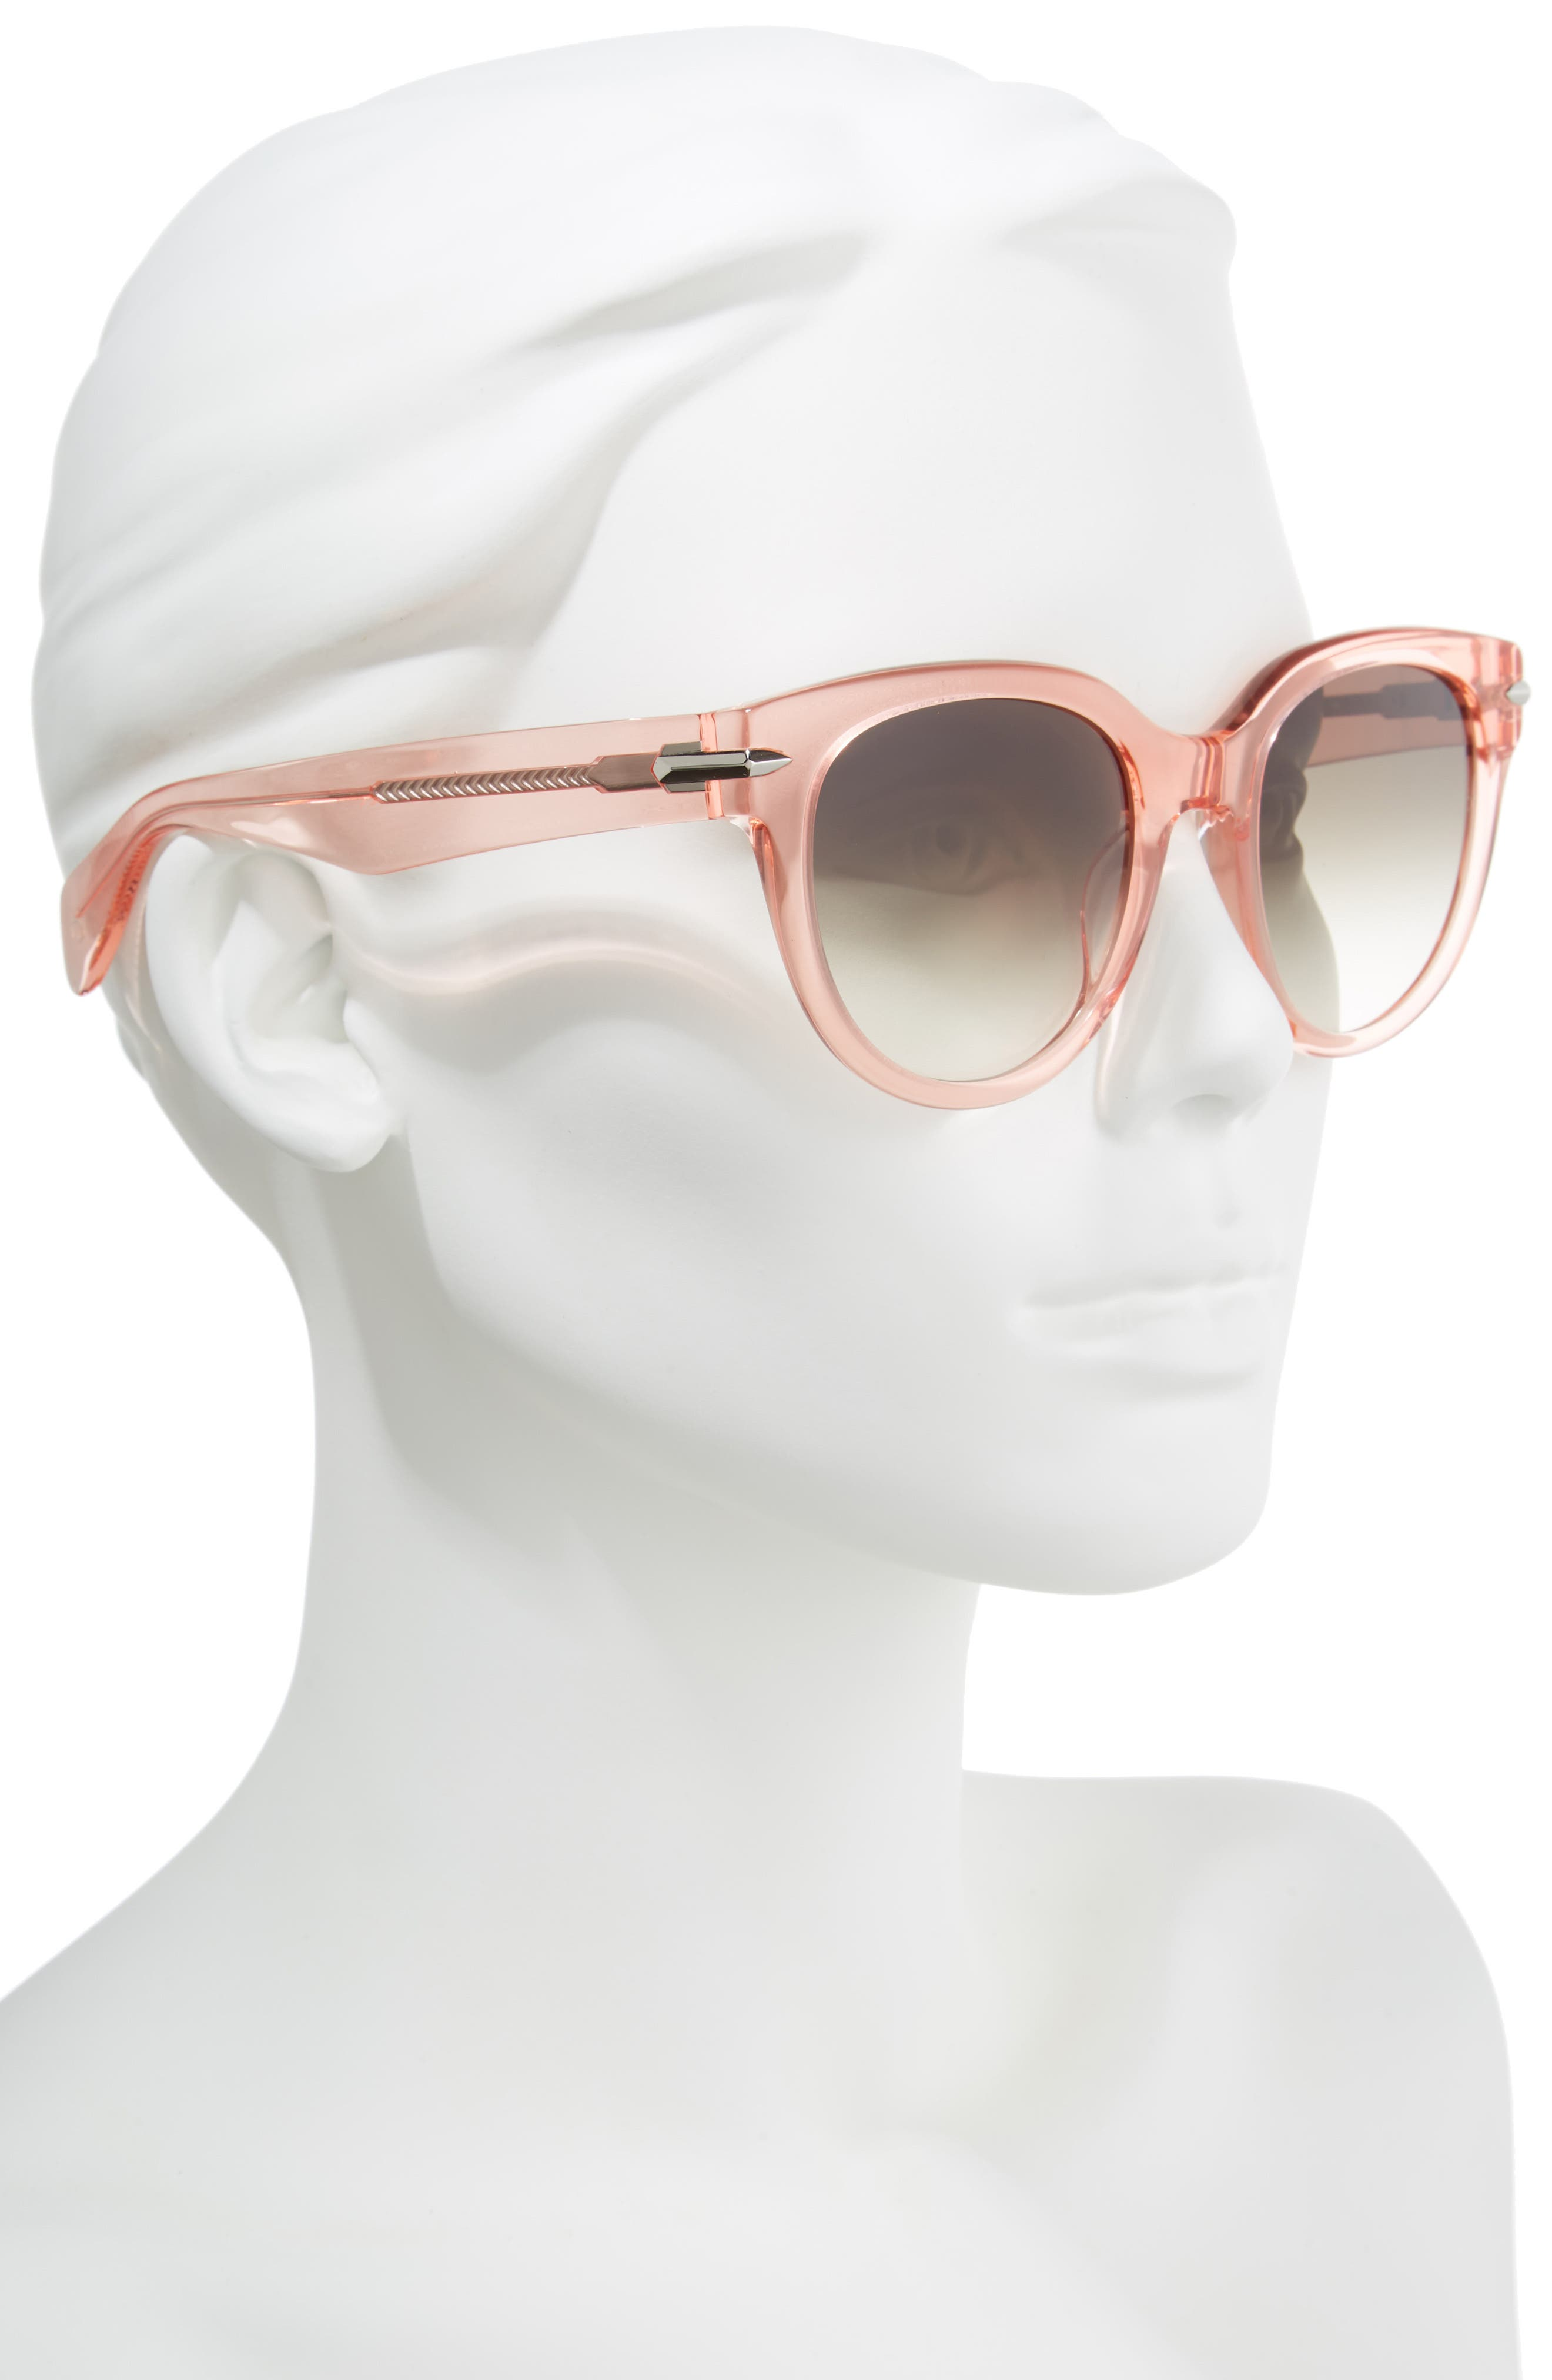 54mm Cat Eye Sunglasses,                             Alternate thumbnail 2, color,                             PINK